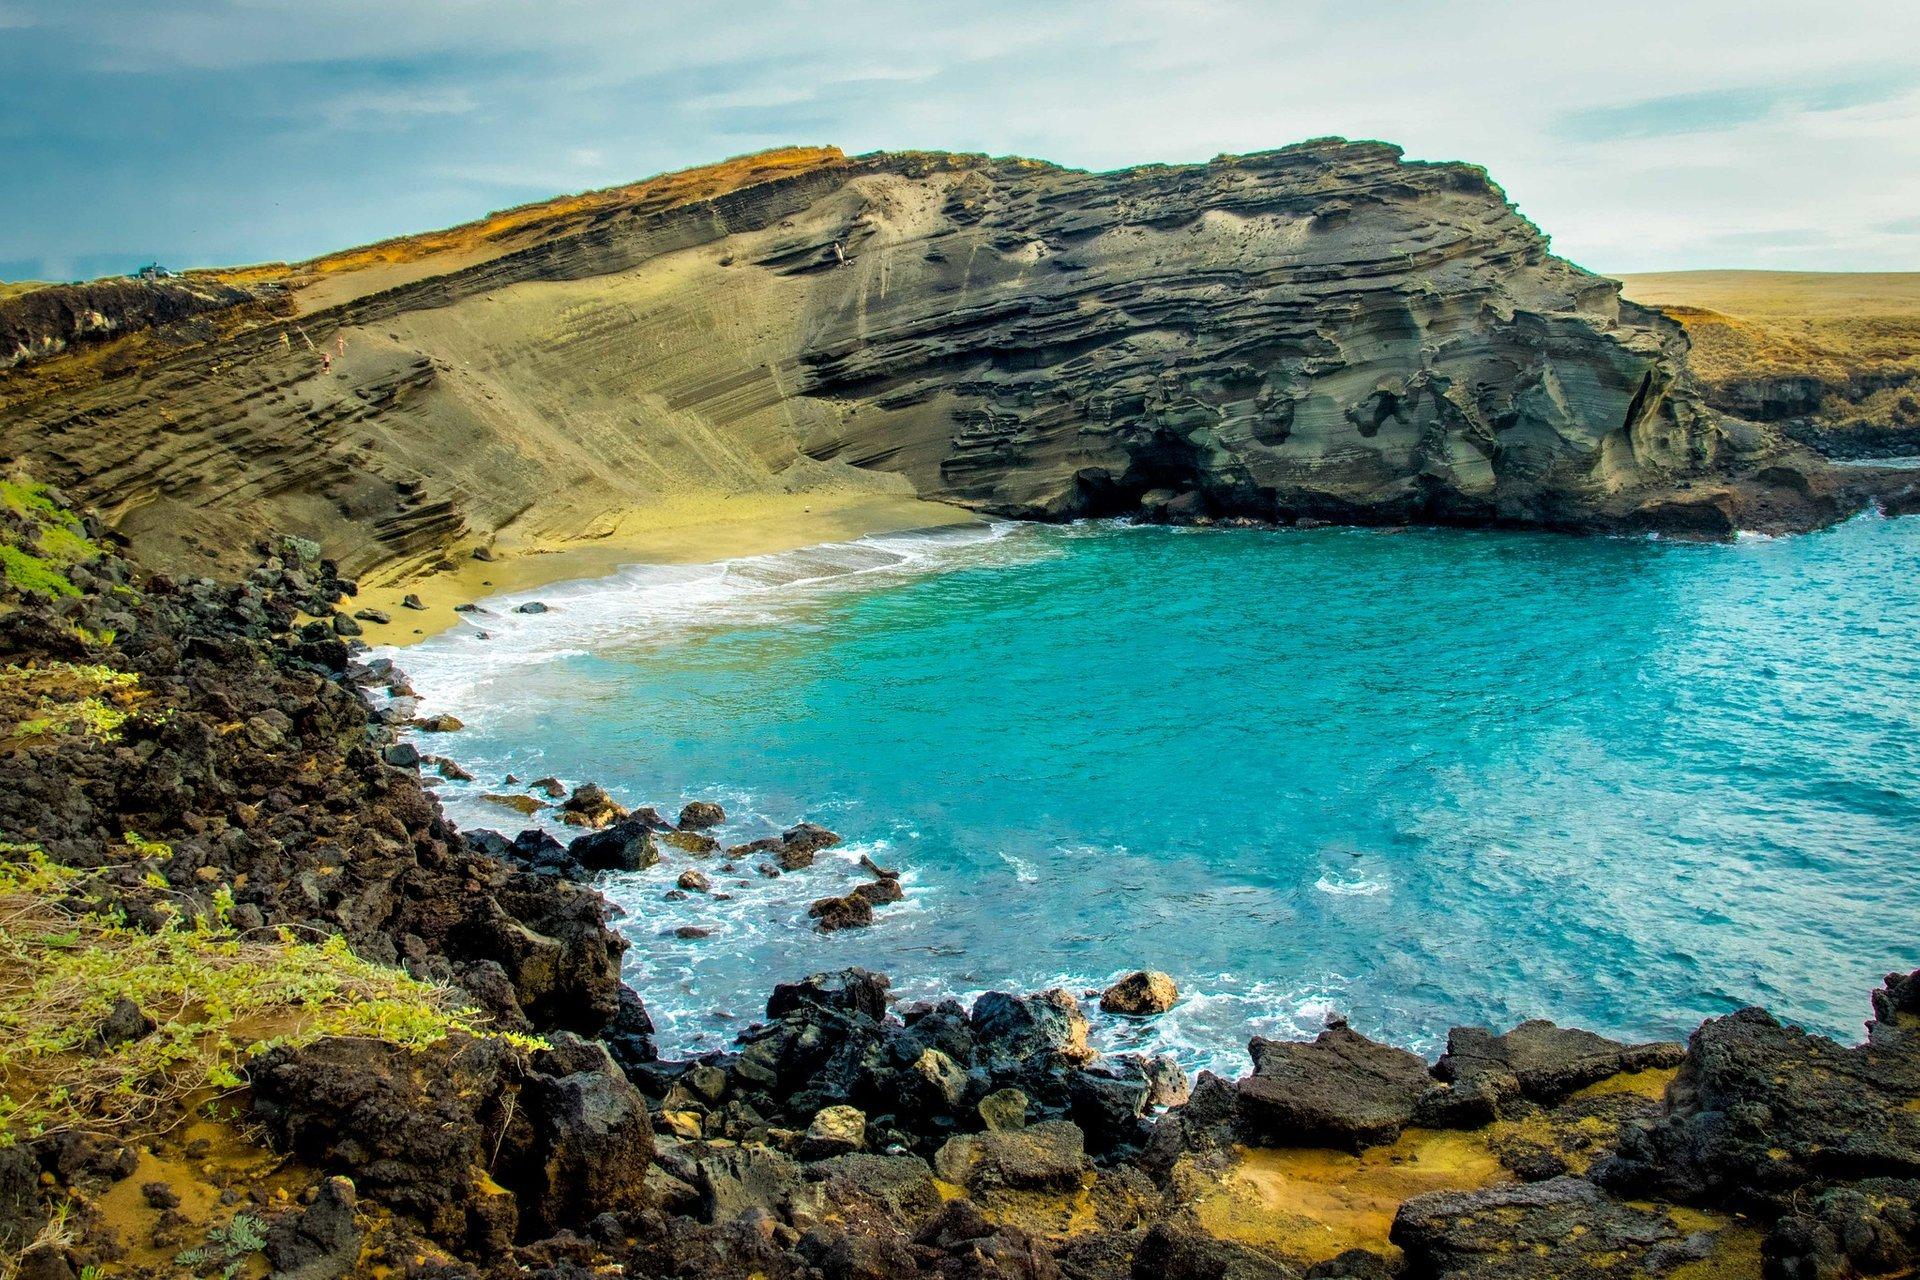 Green Sand Beach (Papakōlea) in Hawaii 2020 - Best Time